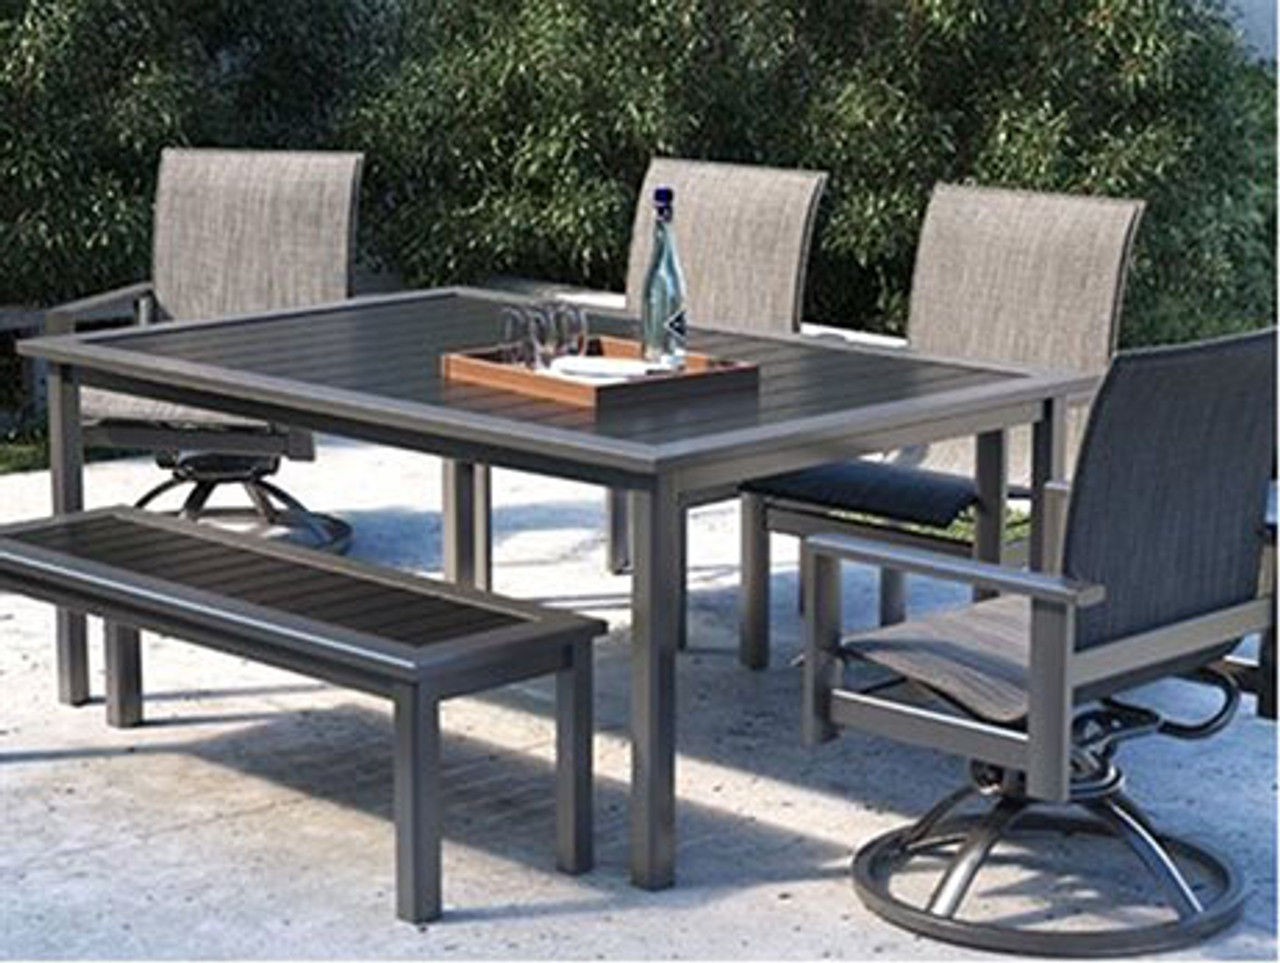 Tremendous Homecrest Elements Aluminum Dining Set Uwap Interior Chair Design Uwaporg